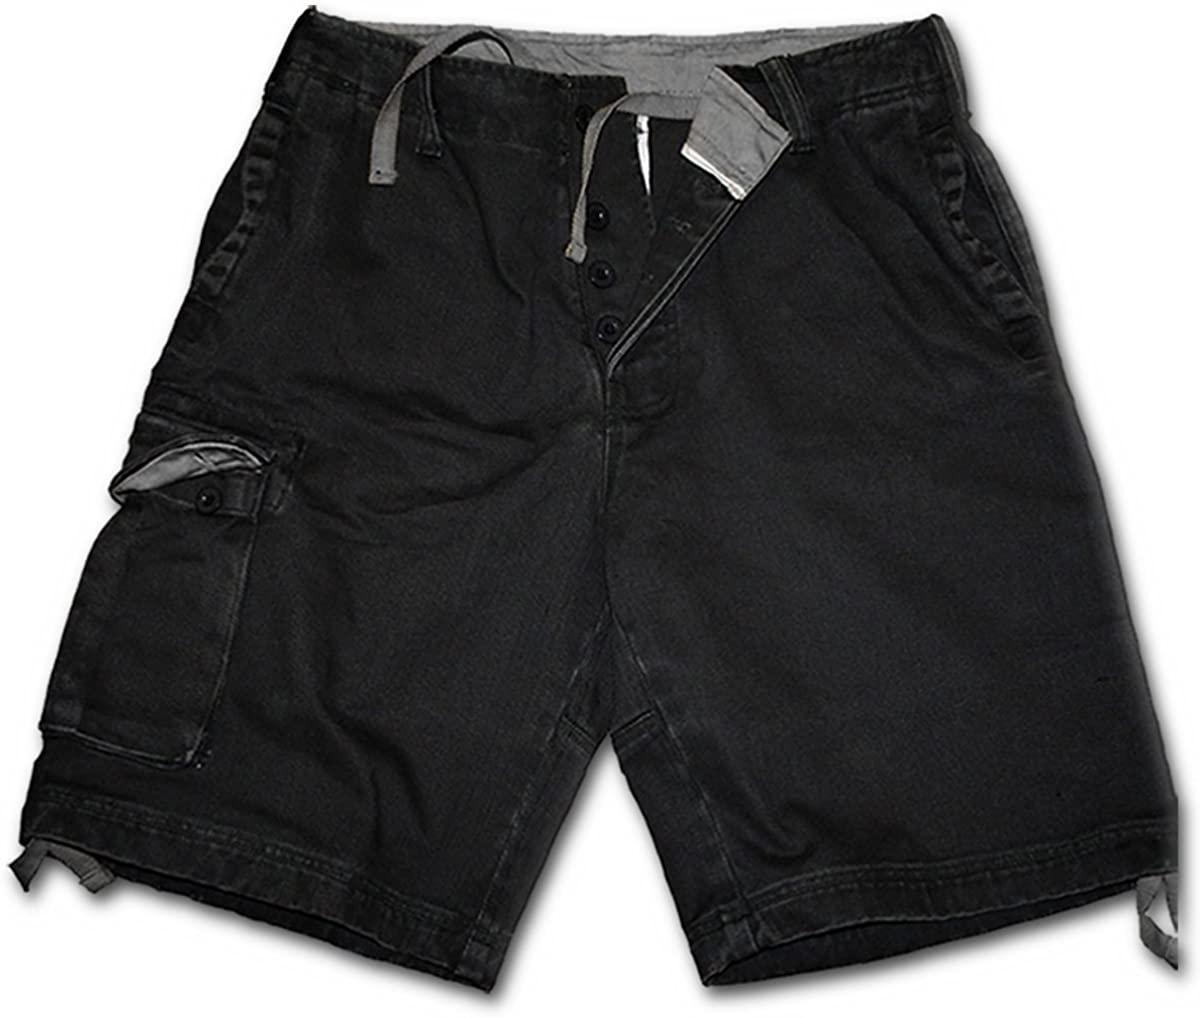 Spiral - Mens - Metal Streetwear - Vintage Cargo Shorts Black